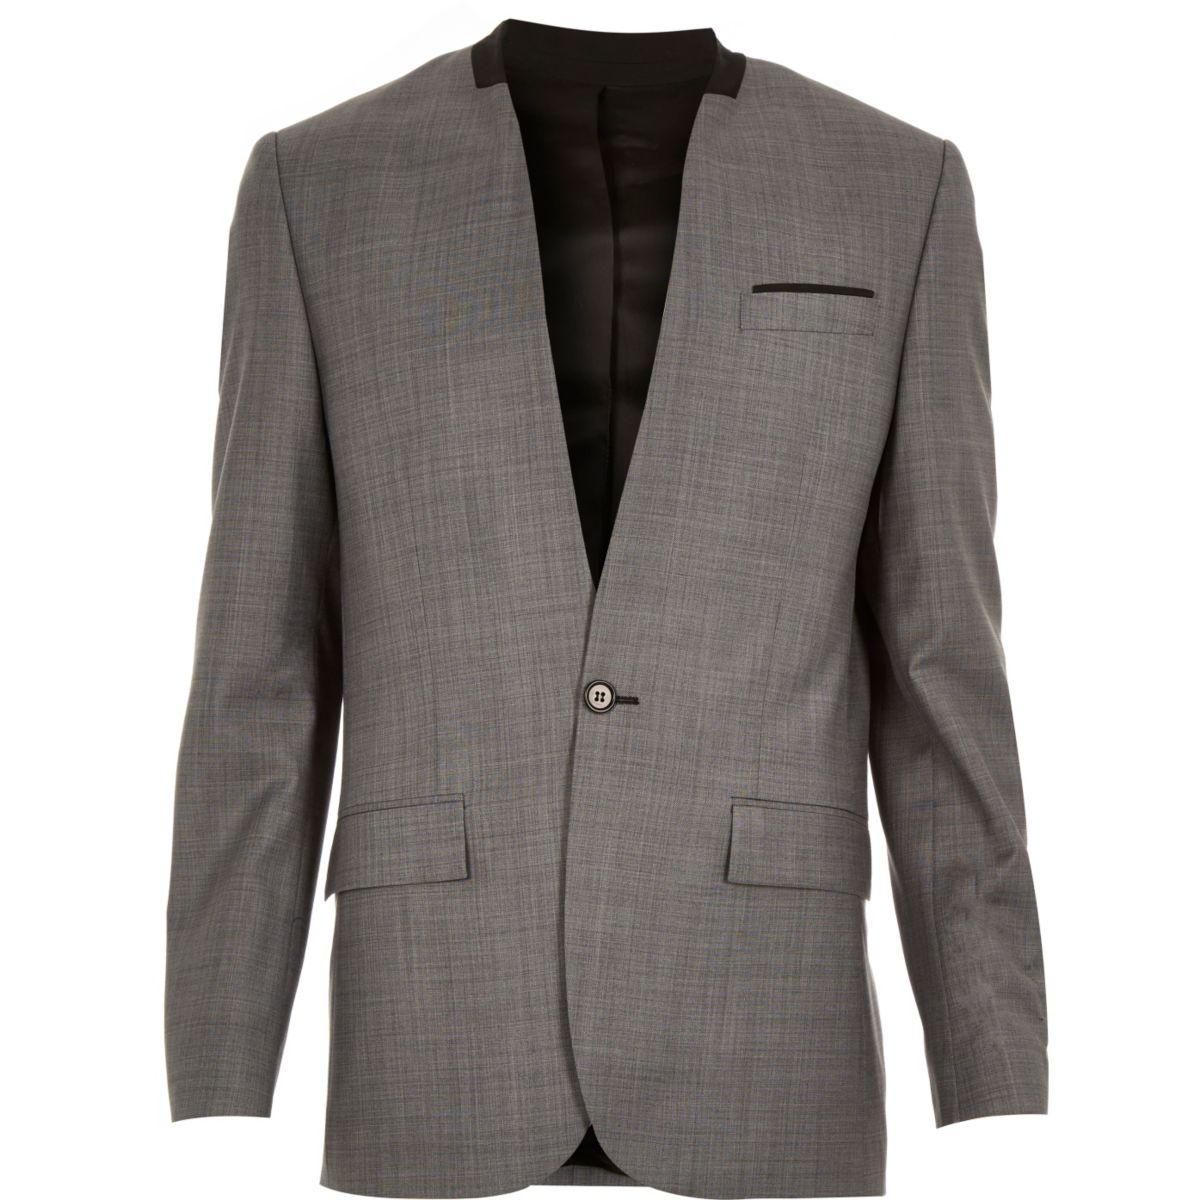 Grey collarless wool-blend slim suit jacket